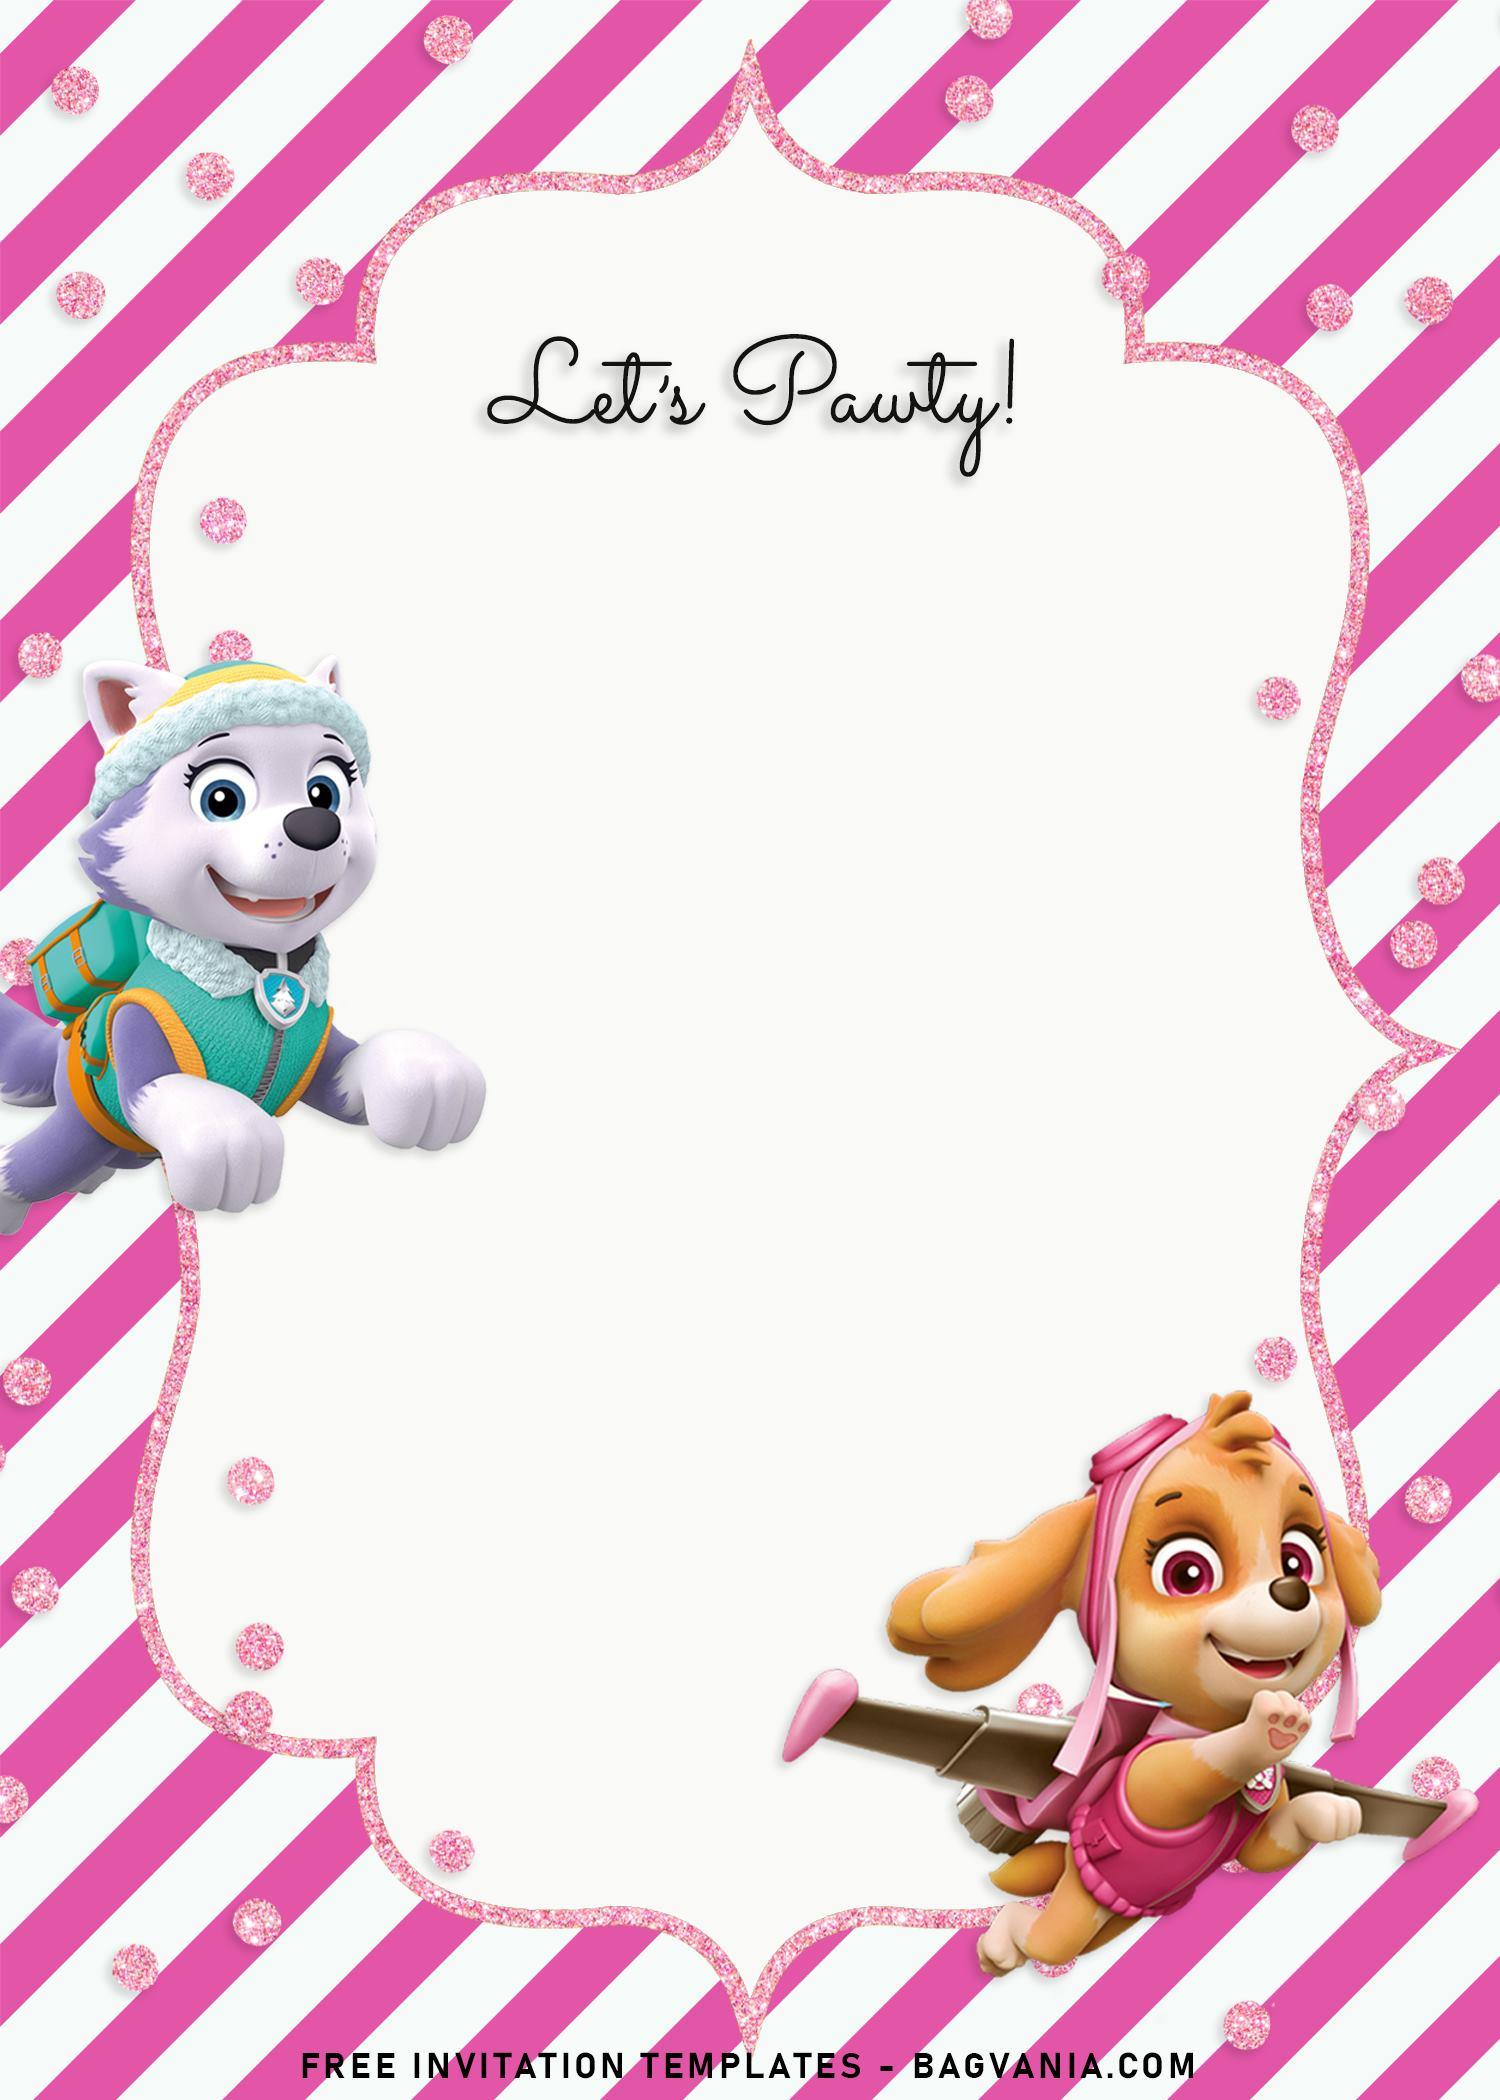 8 Adorable Skye And Everest Paw Patrol Birthday Invitation Templates Free Printable Birthday Invitation Templates Bagvania